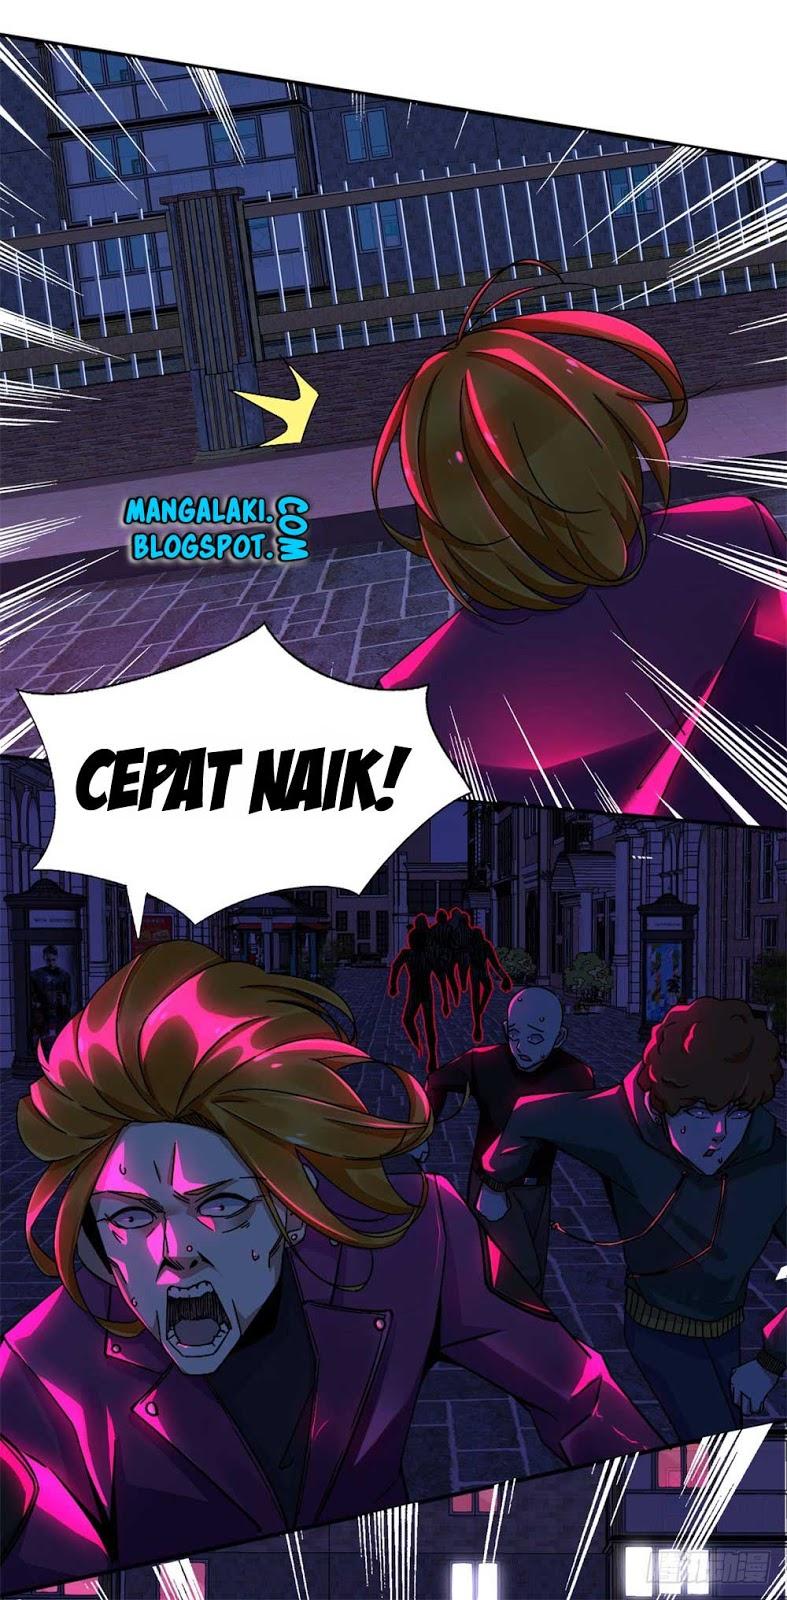 Dilarang COPAS - situs resmi www.mangacanblog.com - Komik king of apocalypse 013 - chapter 13 14 Indonesia king of apocalypse 013 - chapter 13 Terbaru 4|Baca Manga Komik Indonesia|Mangacan